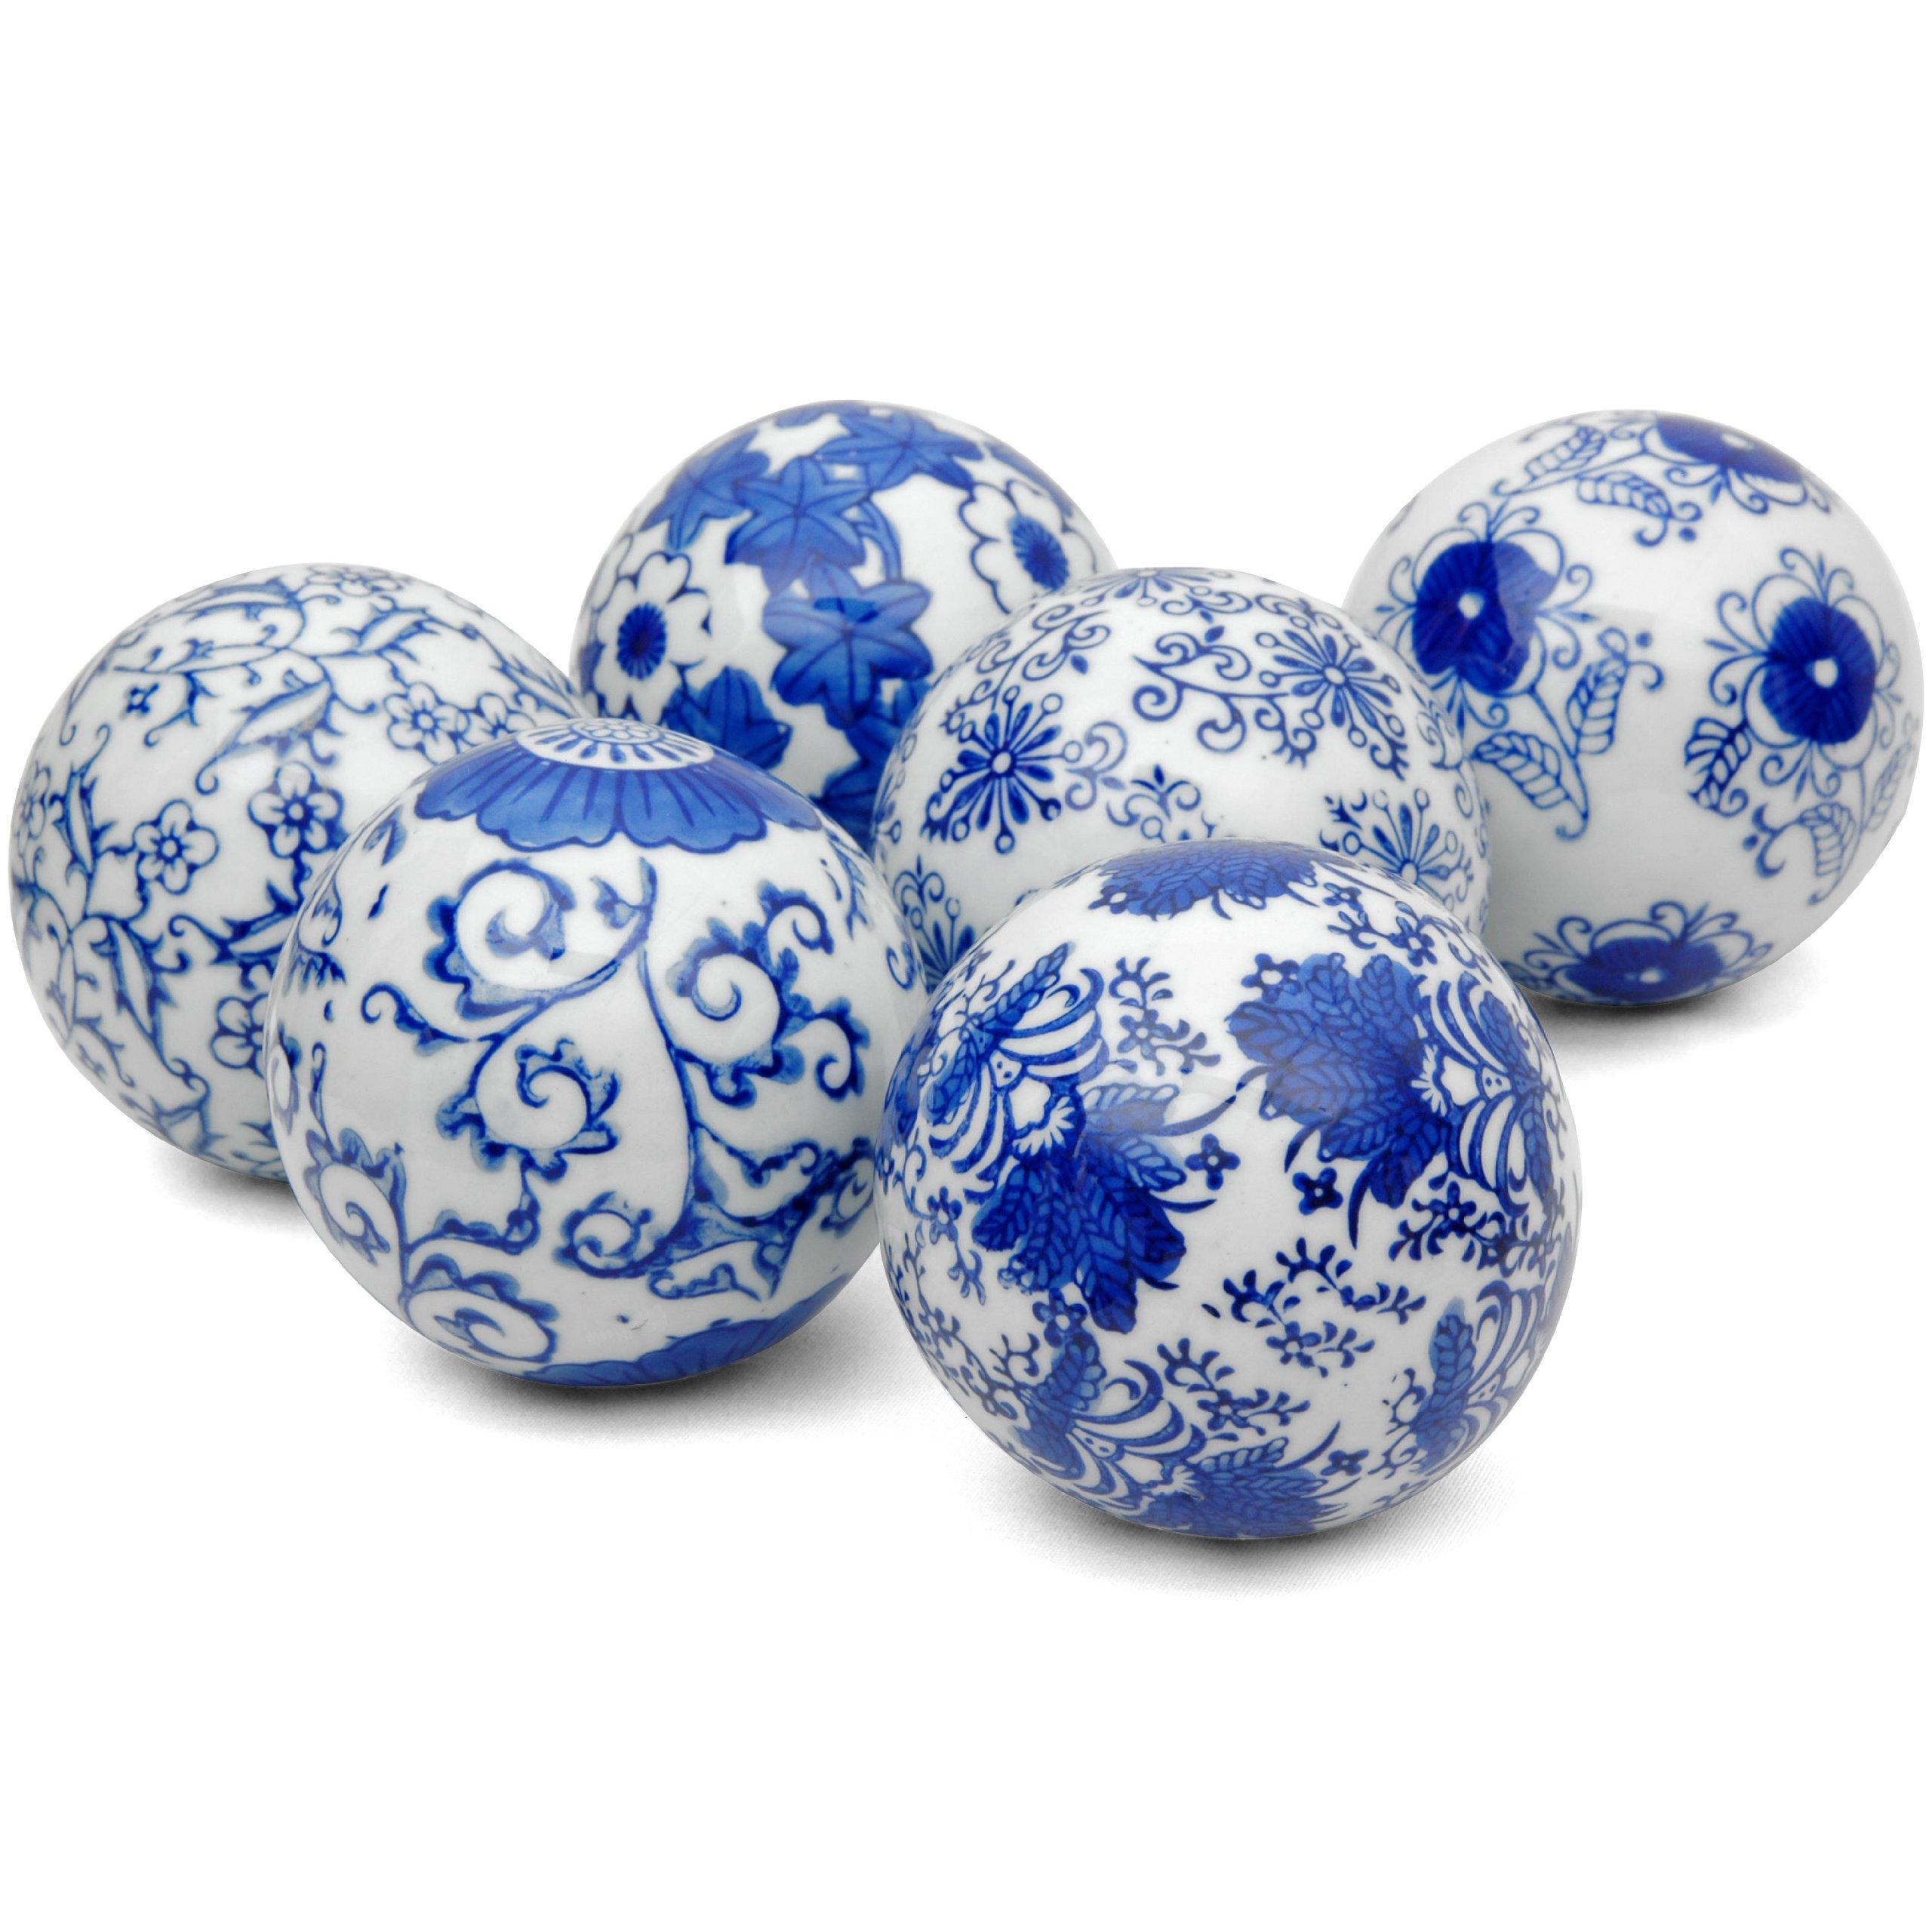 Oriental Furniture 3'' Blue & White Decorative Porcelain Ball Set(B) by ORIENTAL Furniture